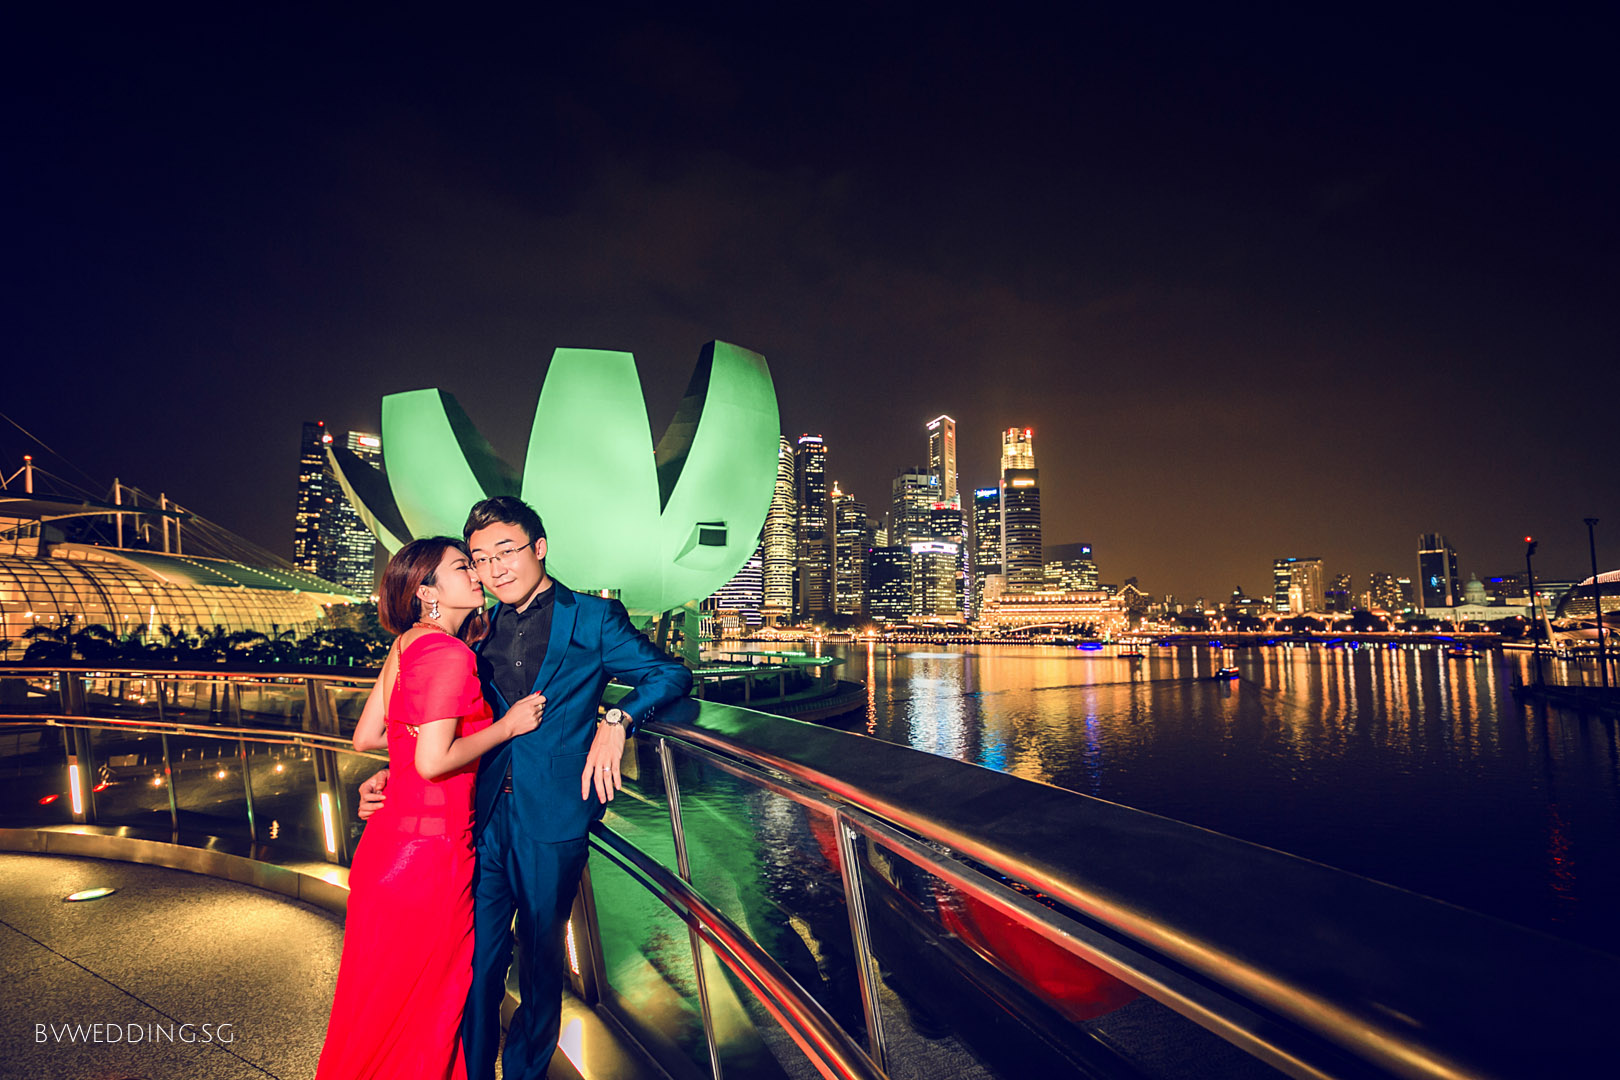 Pre-wedding Photoshoot at Helix Bridge